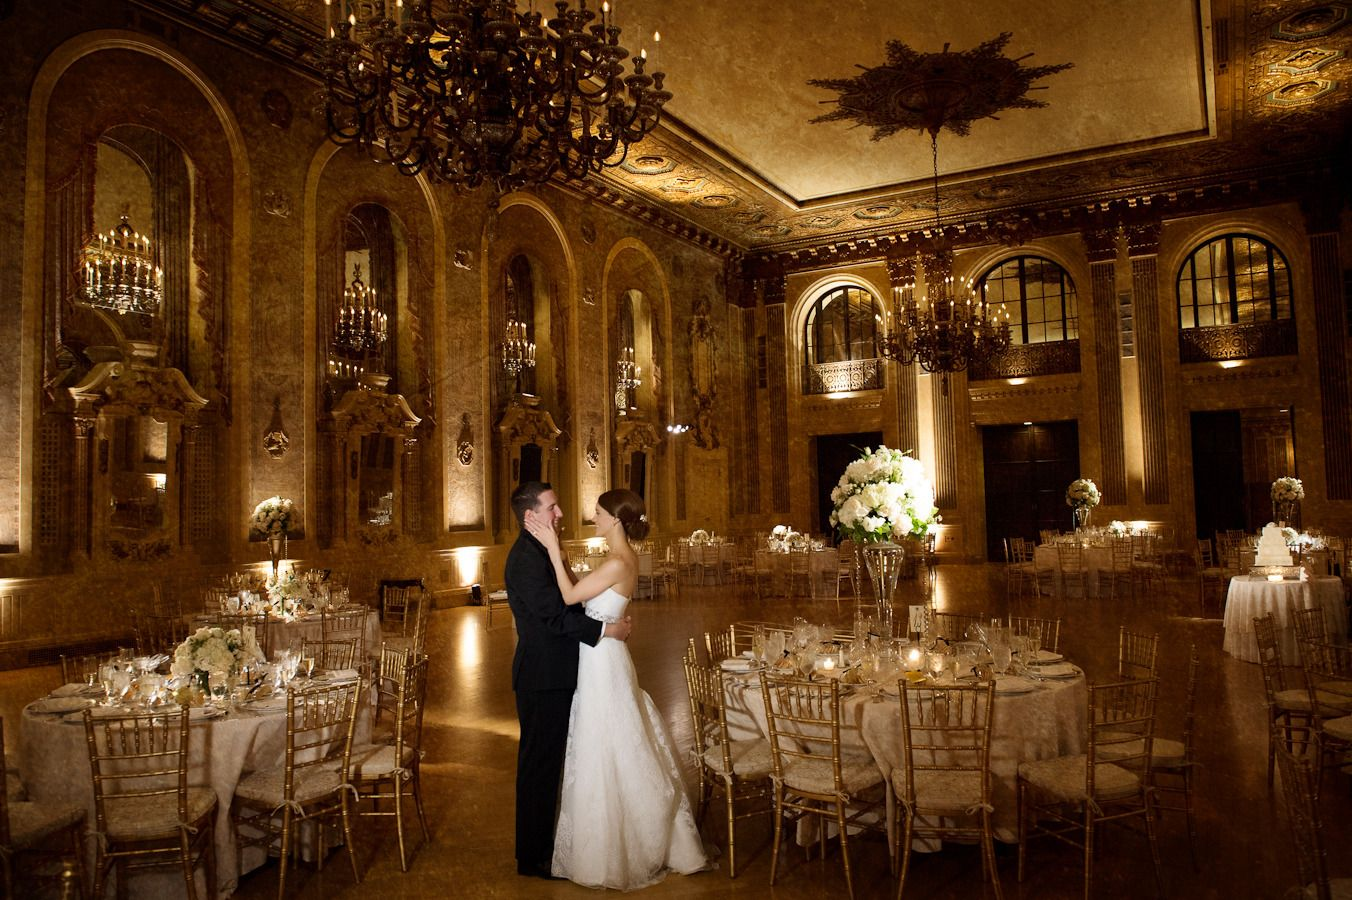 Classic Wilmington Delaware Wedding Delaware Wedding Delaware Wedding Photographer Delaware Wedding Venues